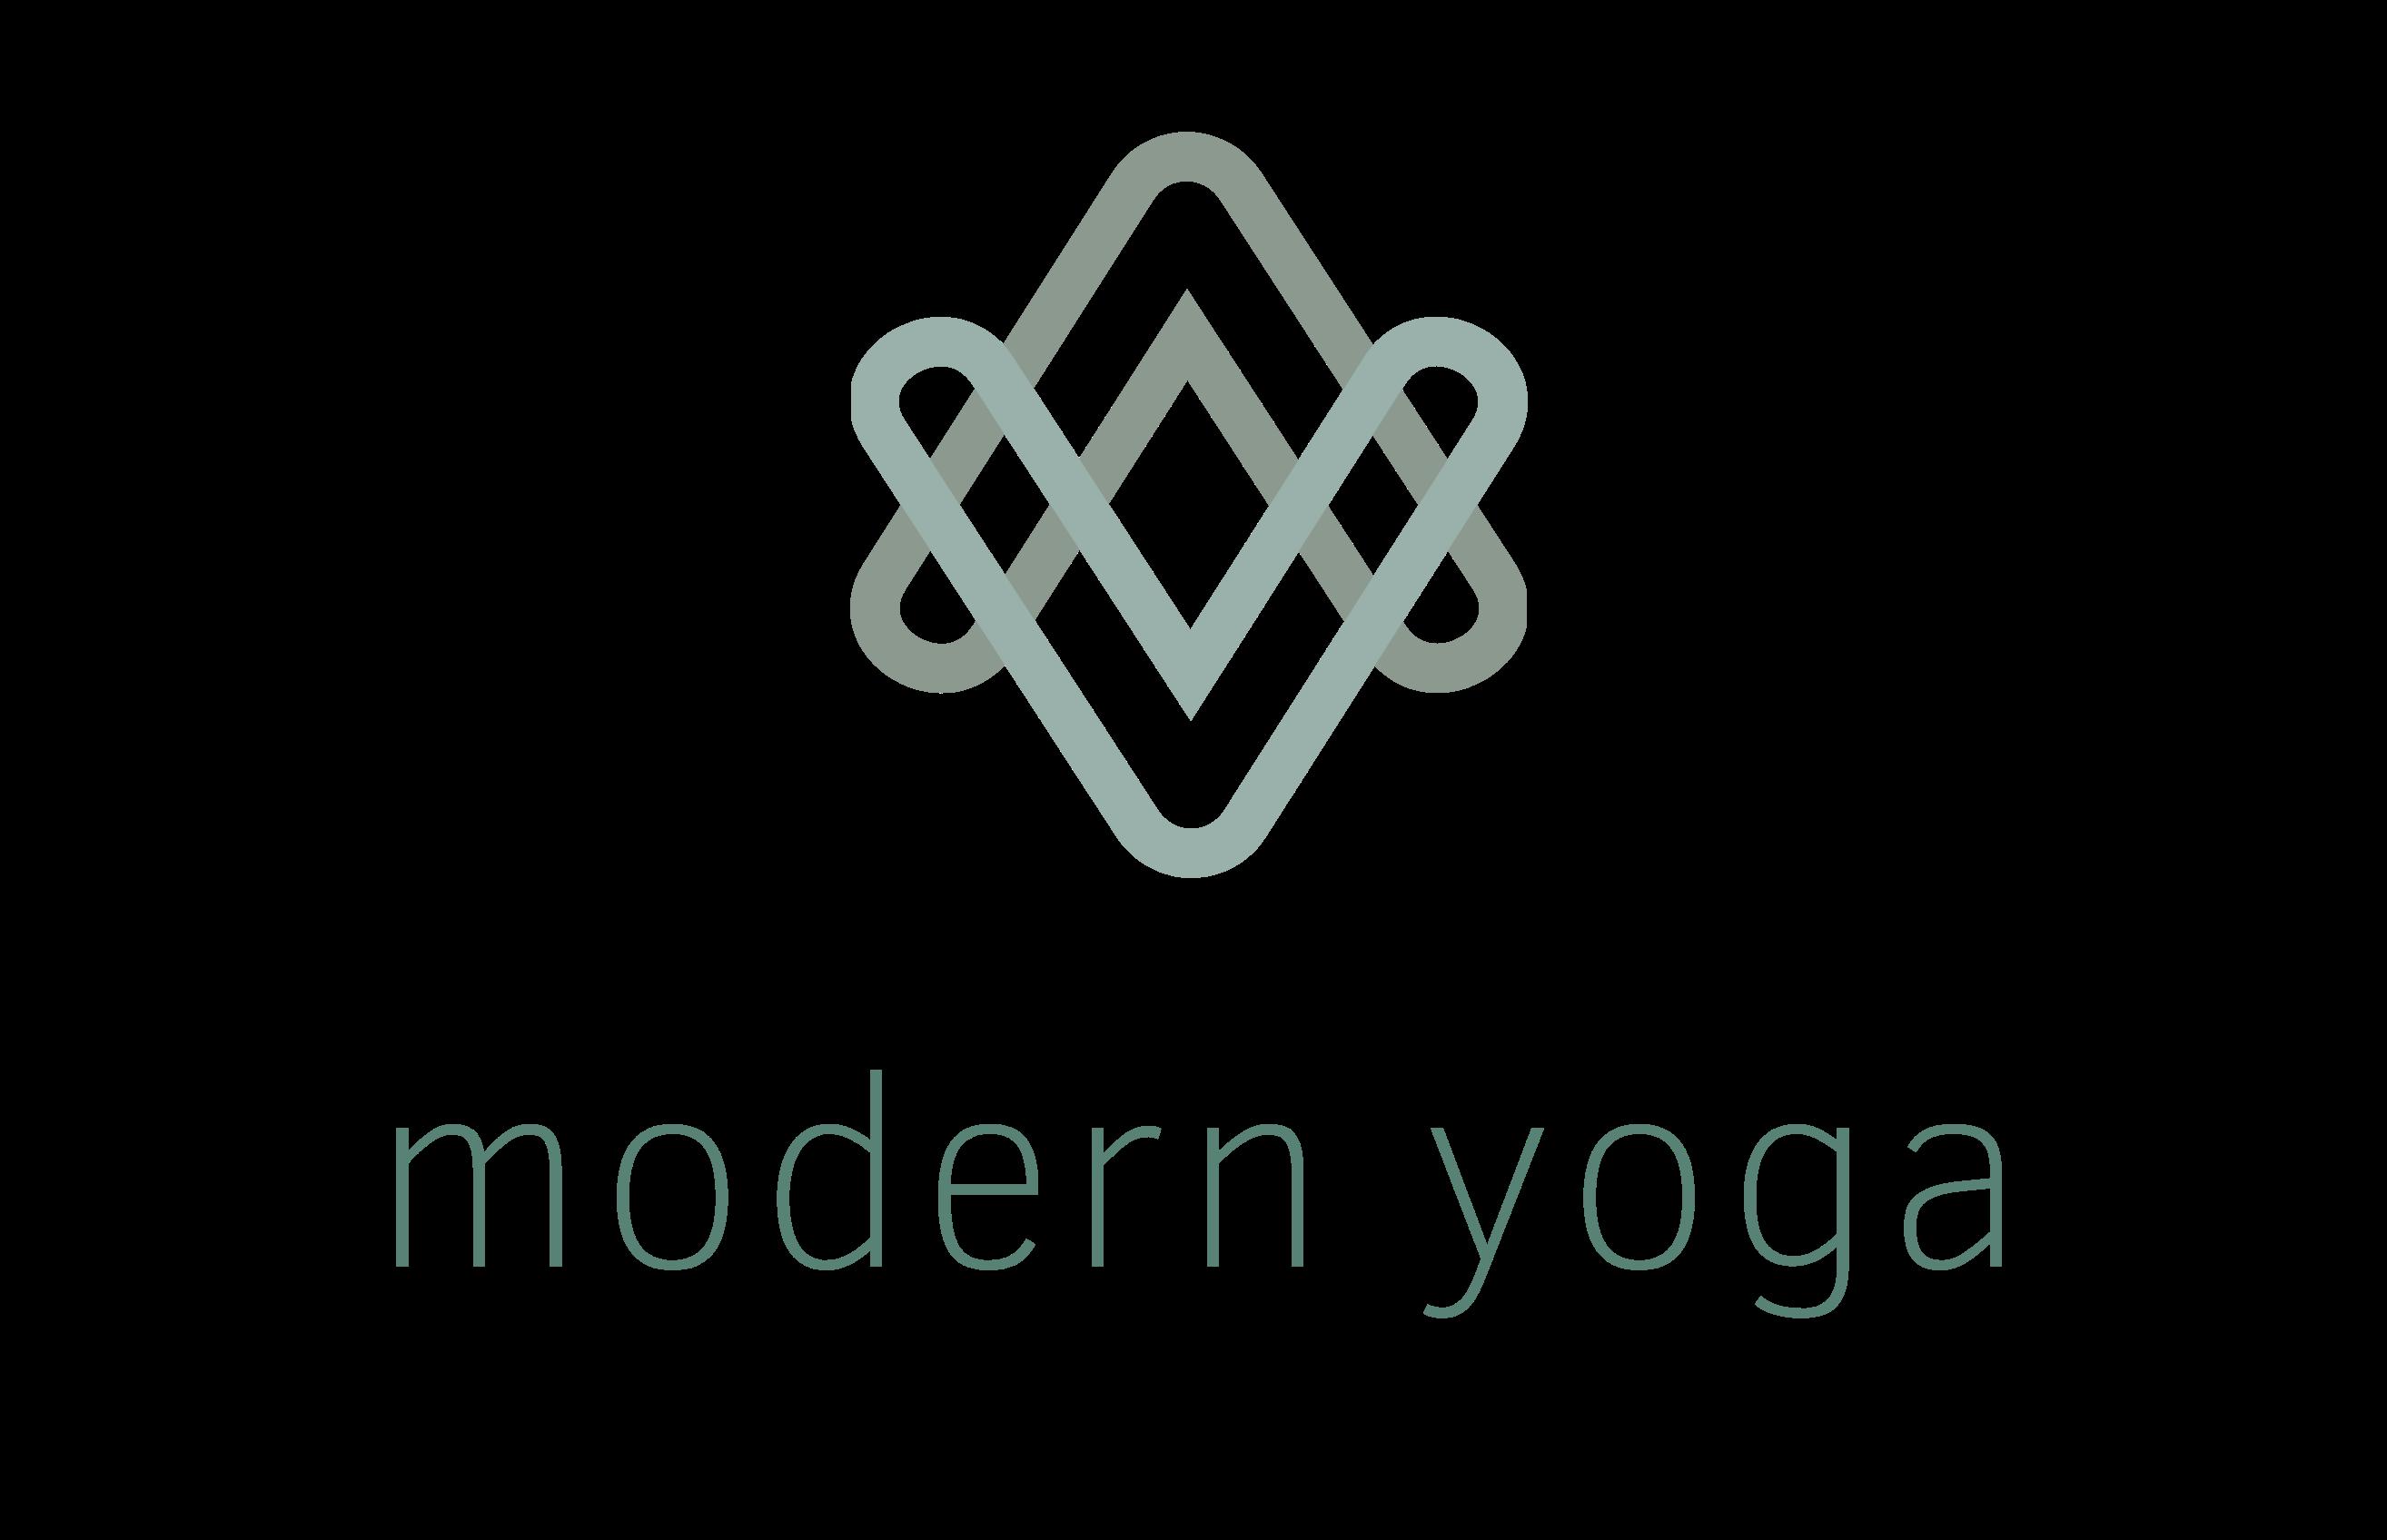 modernyoga